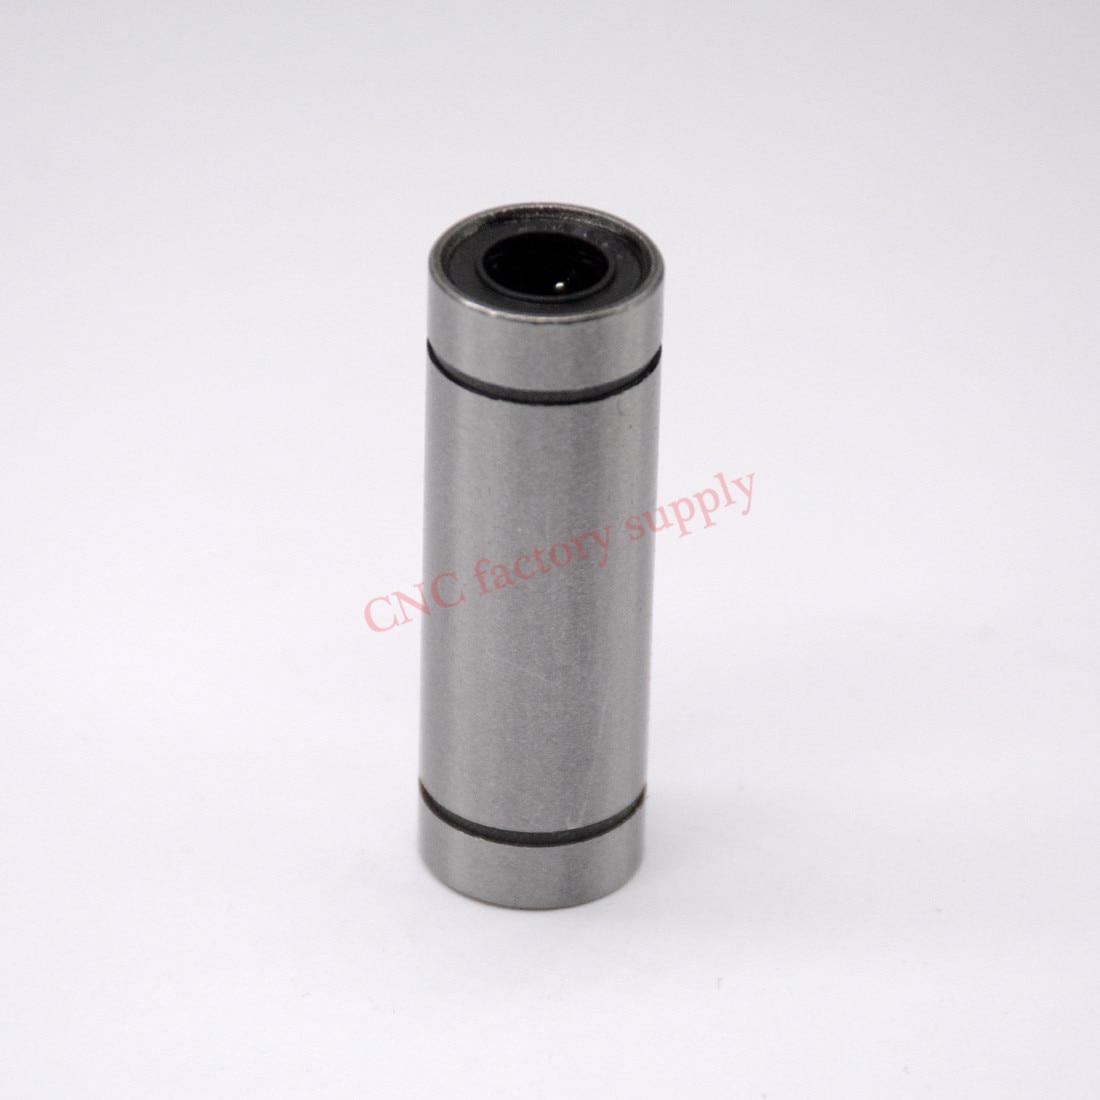 Hot sale 1pc LM20LUU long type 20mm linear ball bearing CNC parts for 3D printer hot sale 1pc lm20uu linear bushing 20mm cnc linear bearings